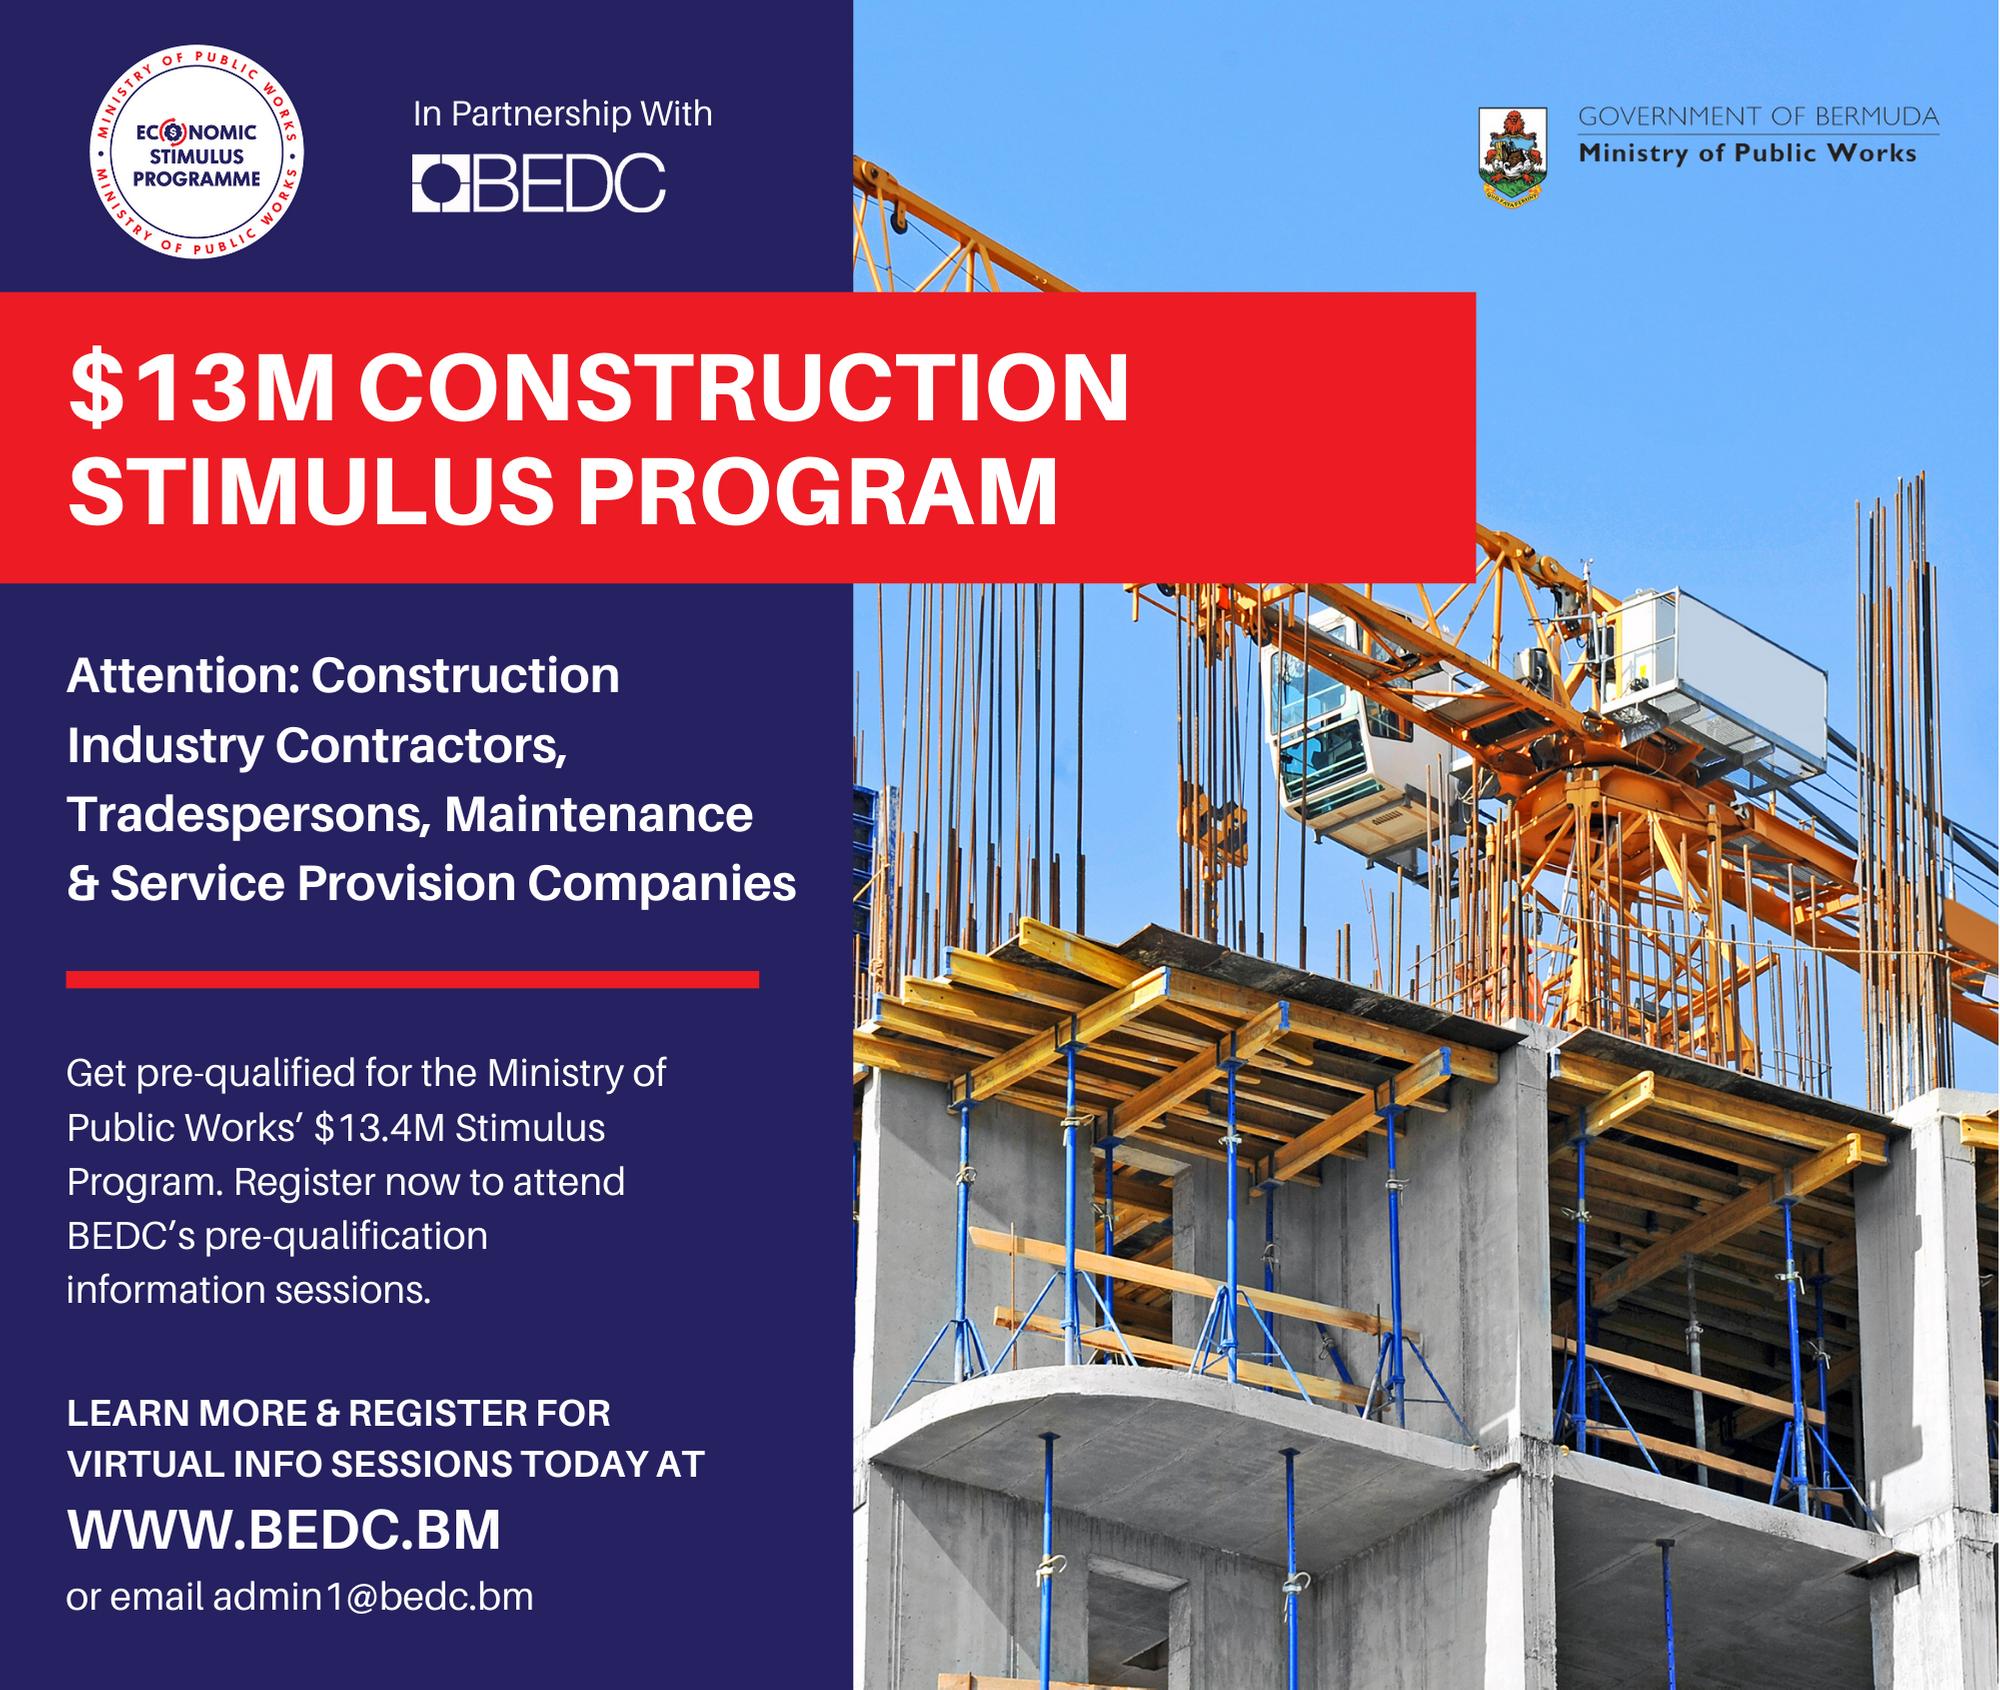 MPW Construction Stimulus Program – Session Recordings & Documents